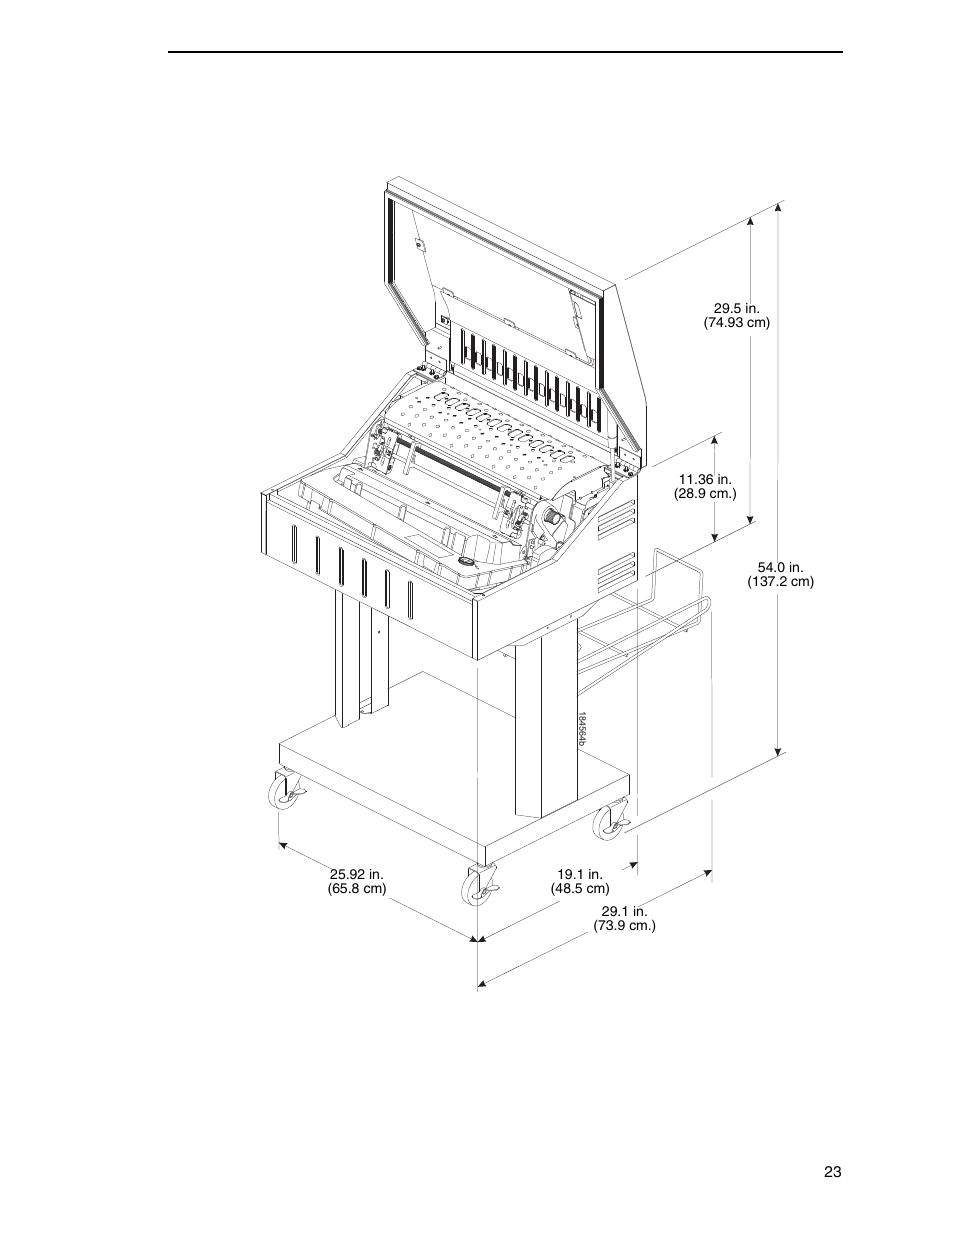 Printronix P8000 Series Cartridge Ribbon Printer User